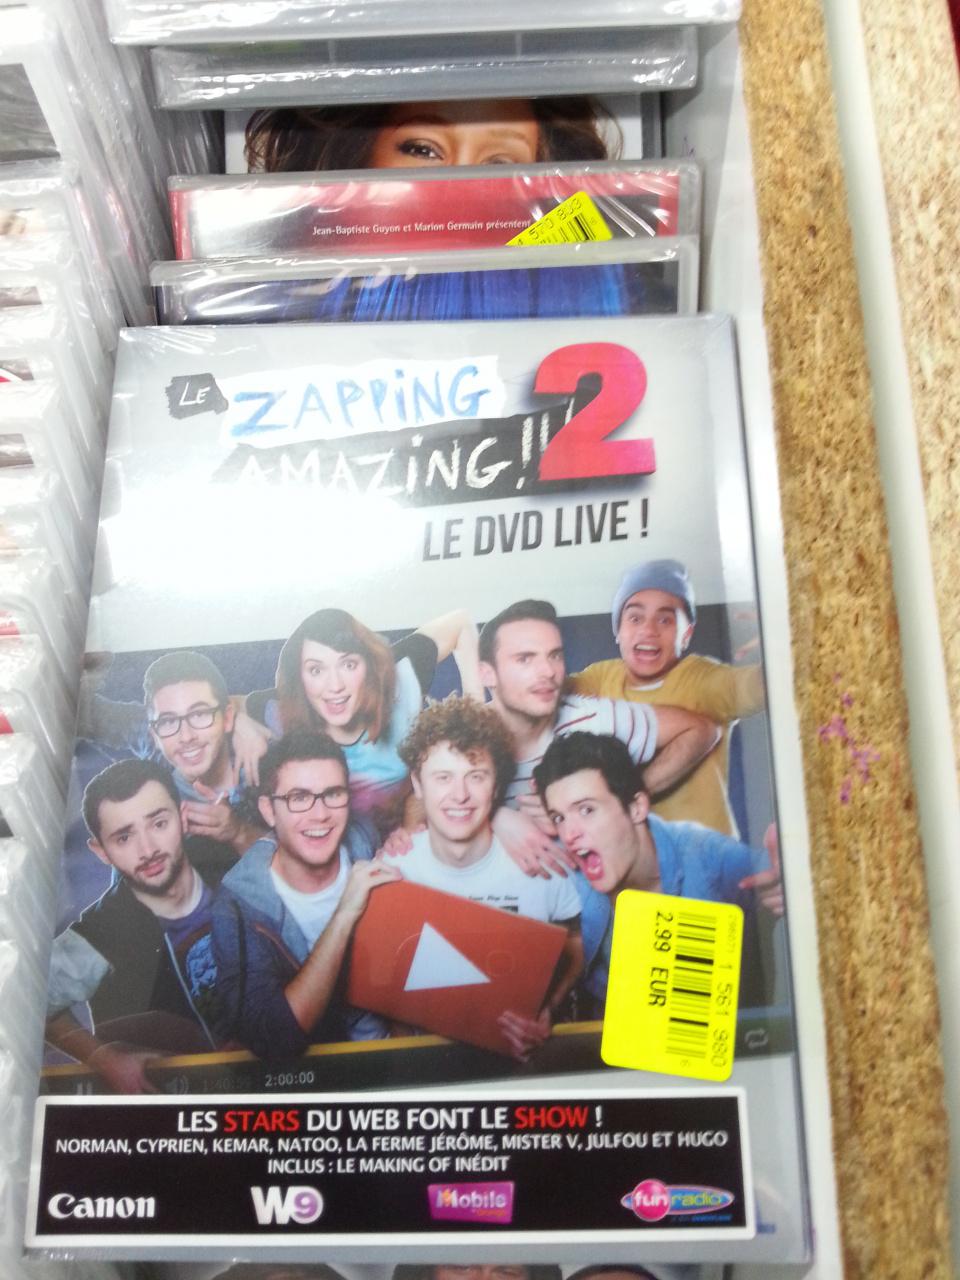 Le Zapping Amazing 2 (avec Norman, Cyprien, Mister V, Hugo...) en DVD